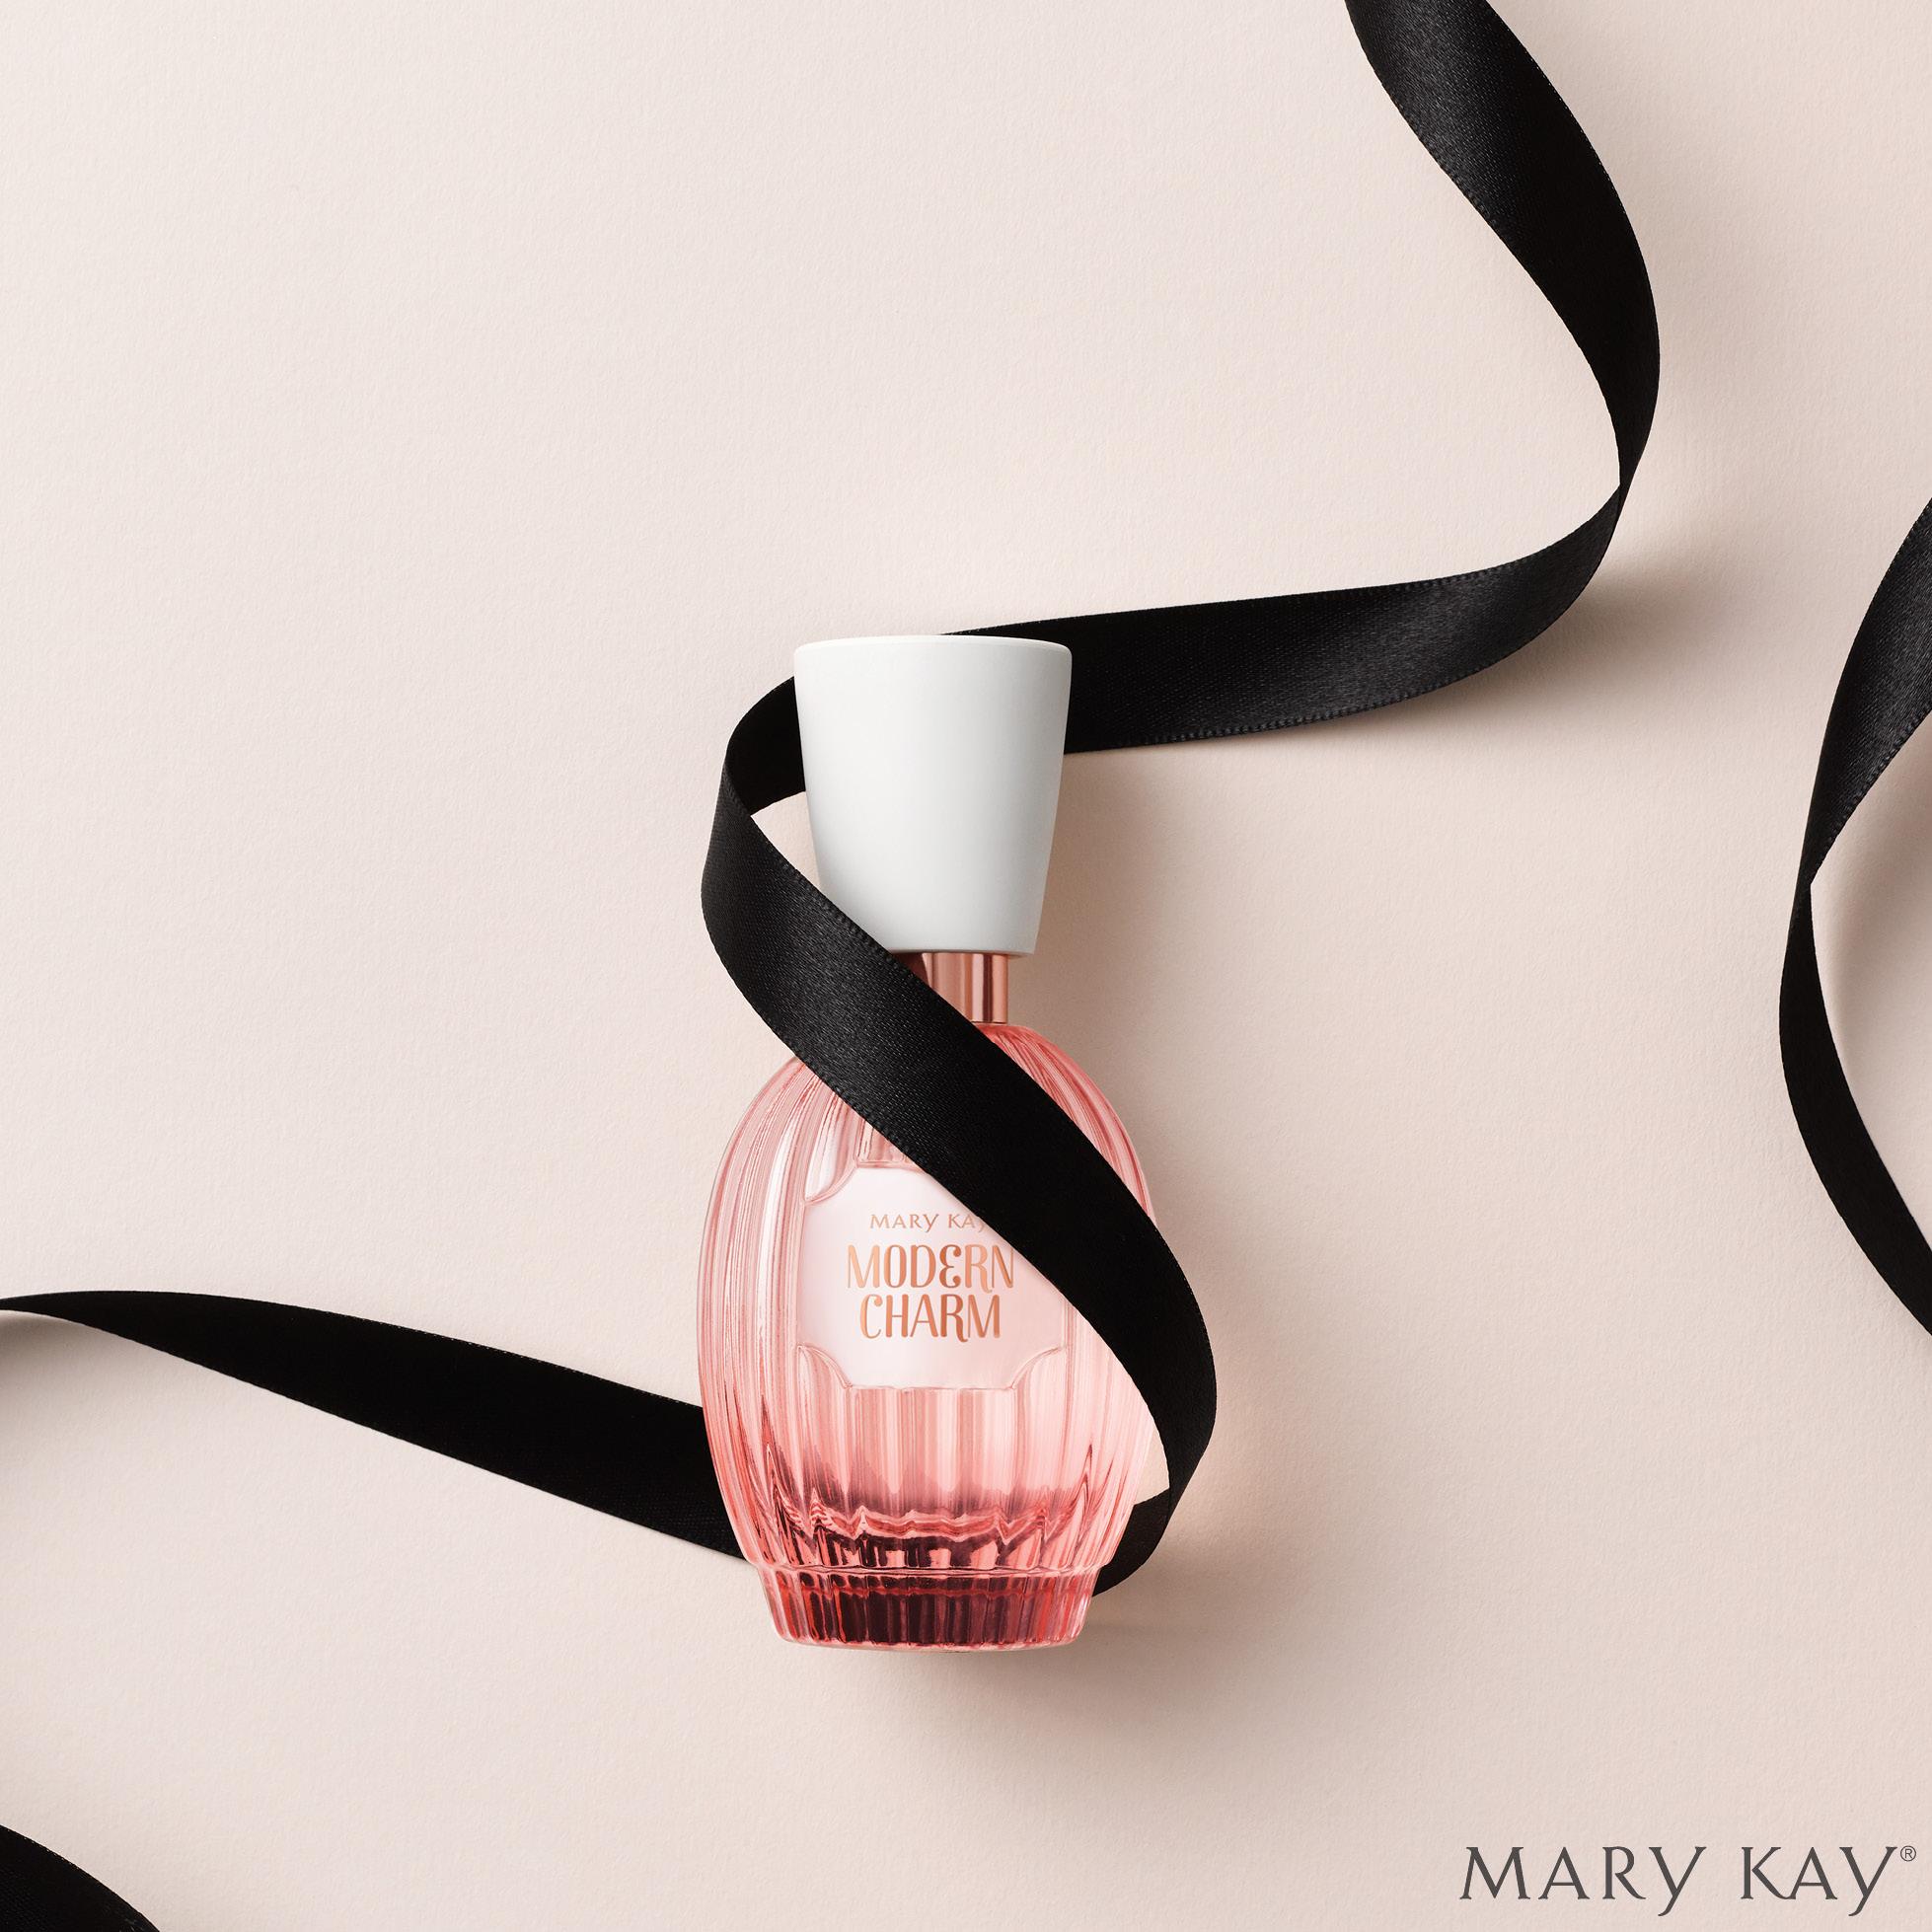 mary-kay-modern-charm-post-launch-gifting-4.jpg